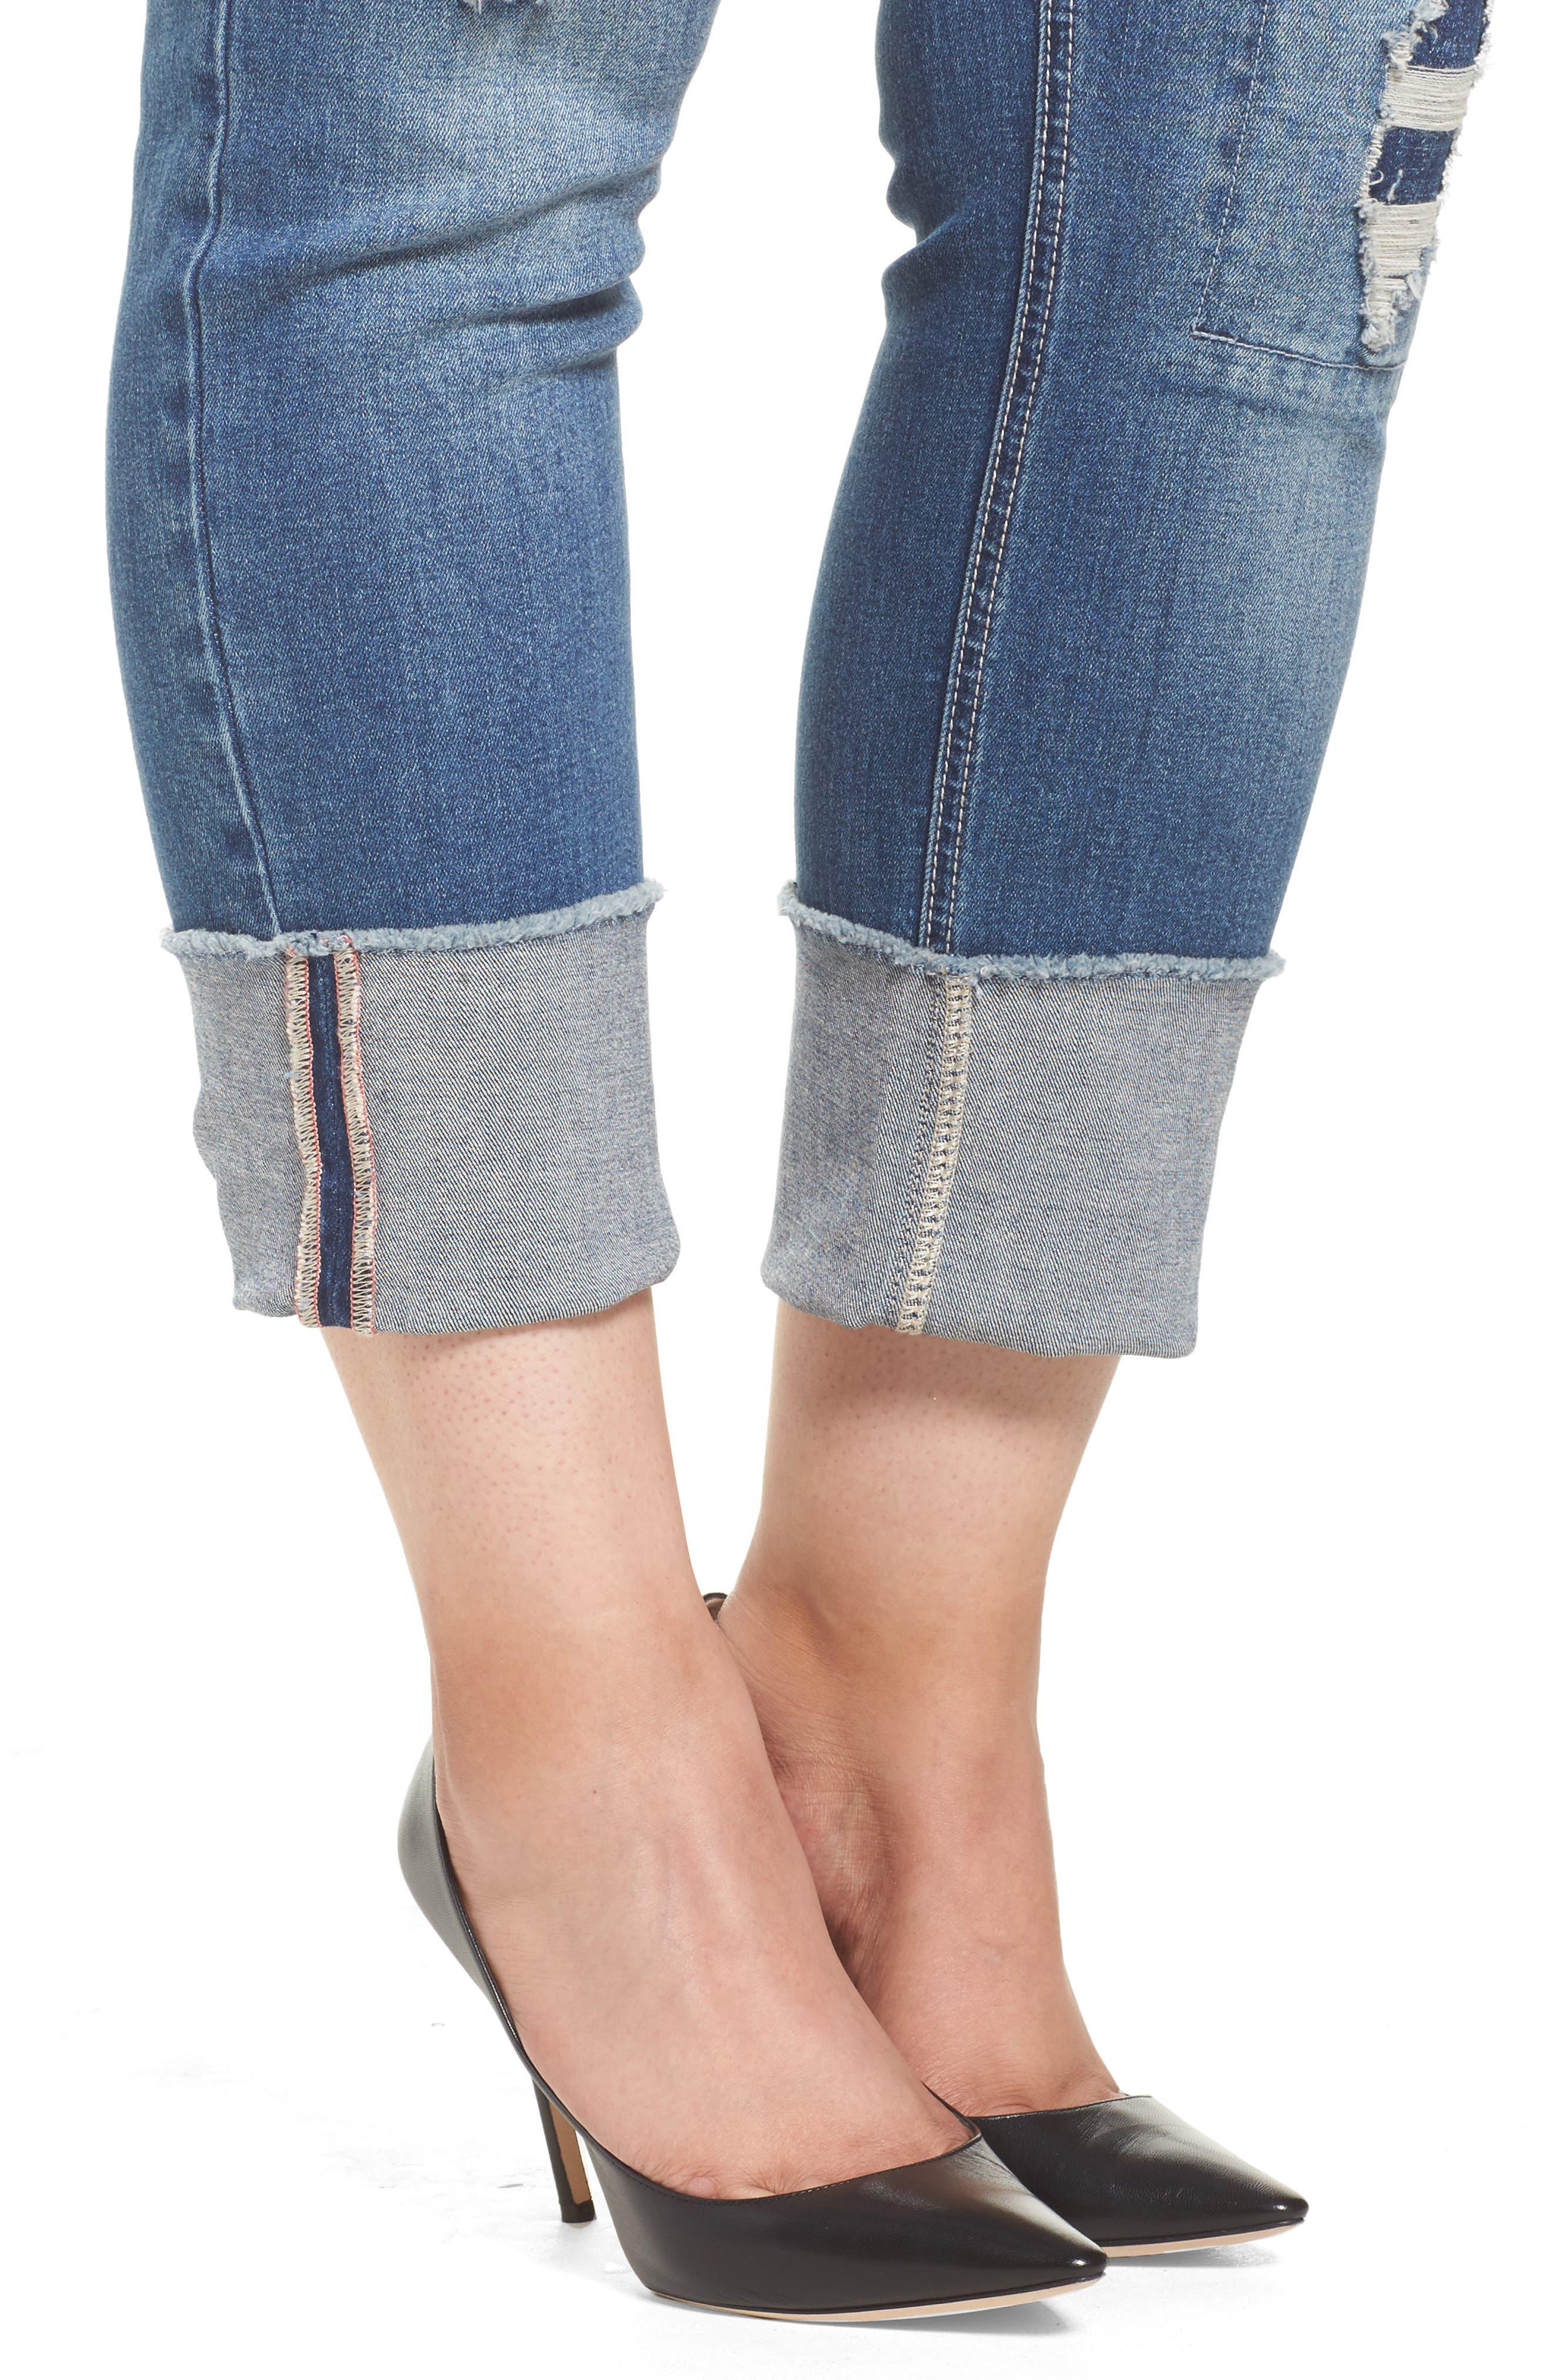 Alternate Image 4  - Seven7 Distressed Slim Raw Hem Cuffed Jeans (Concorde) (Plus Size)